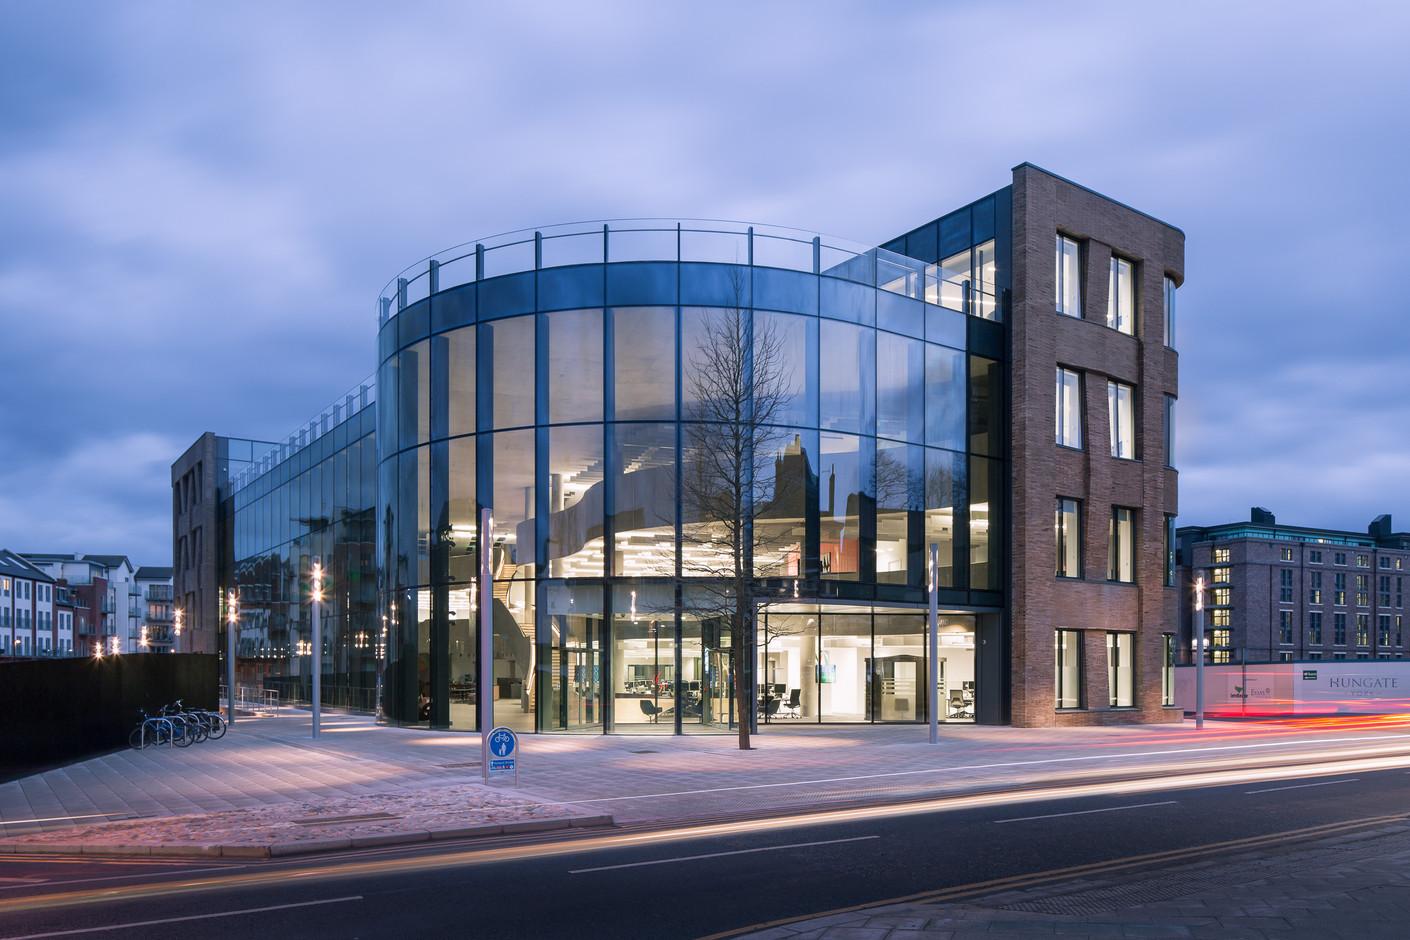 Hiscox Building, York